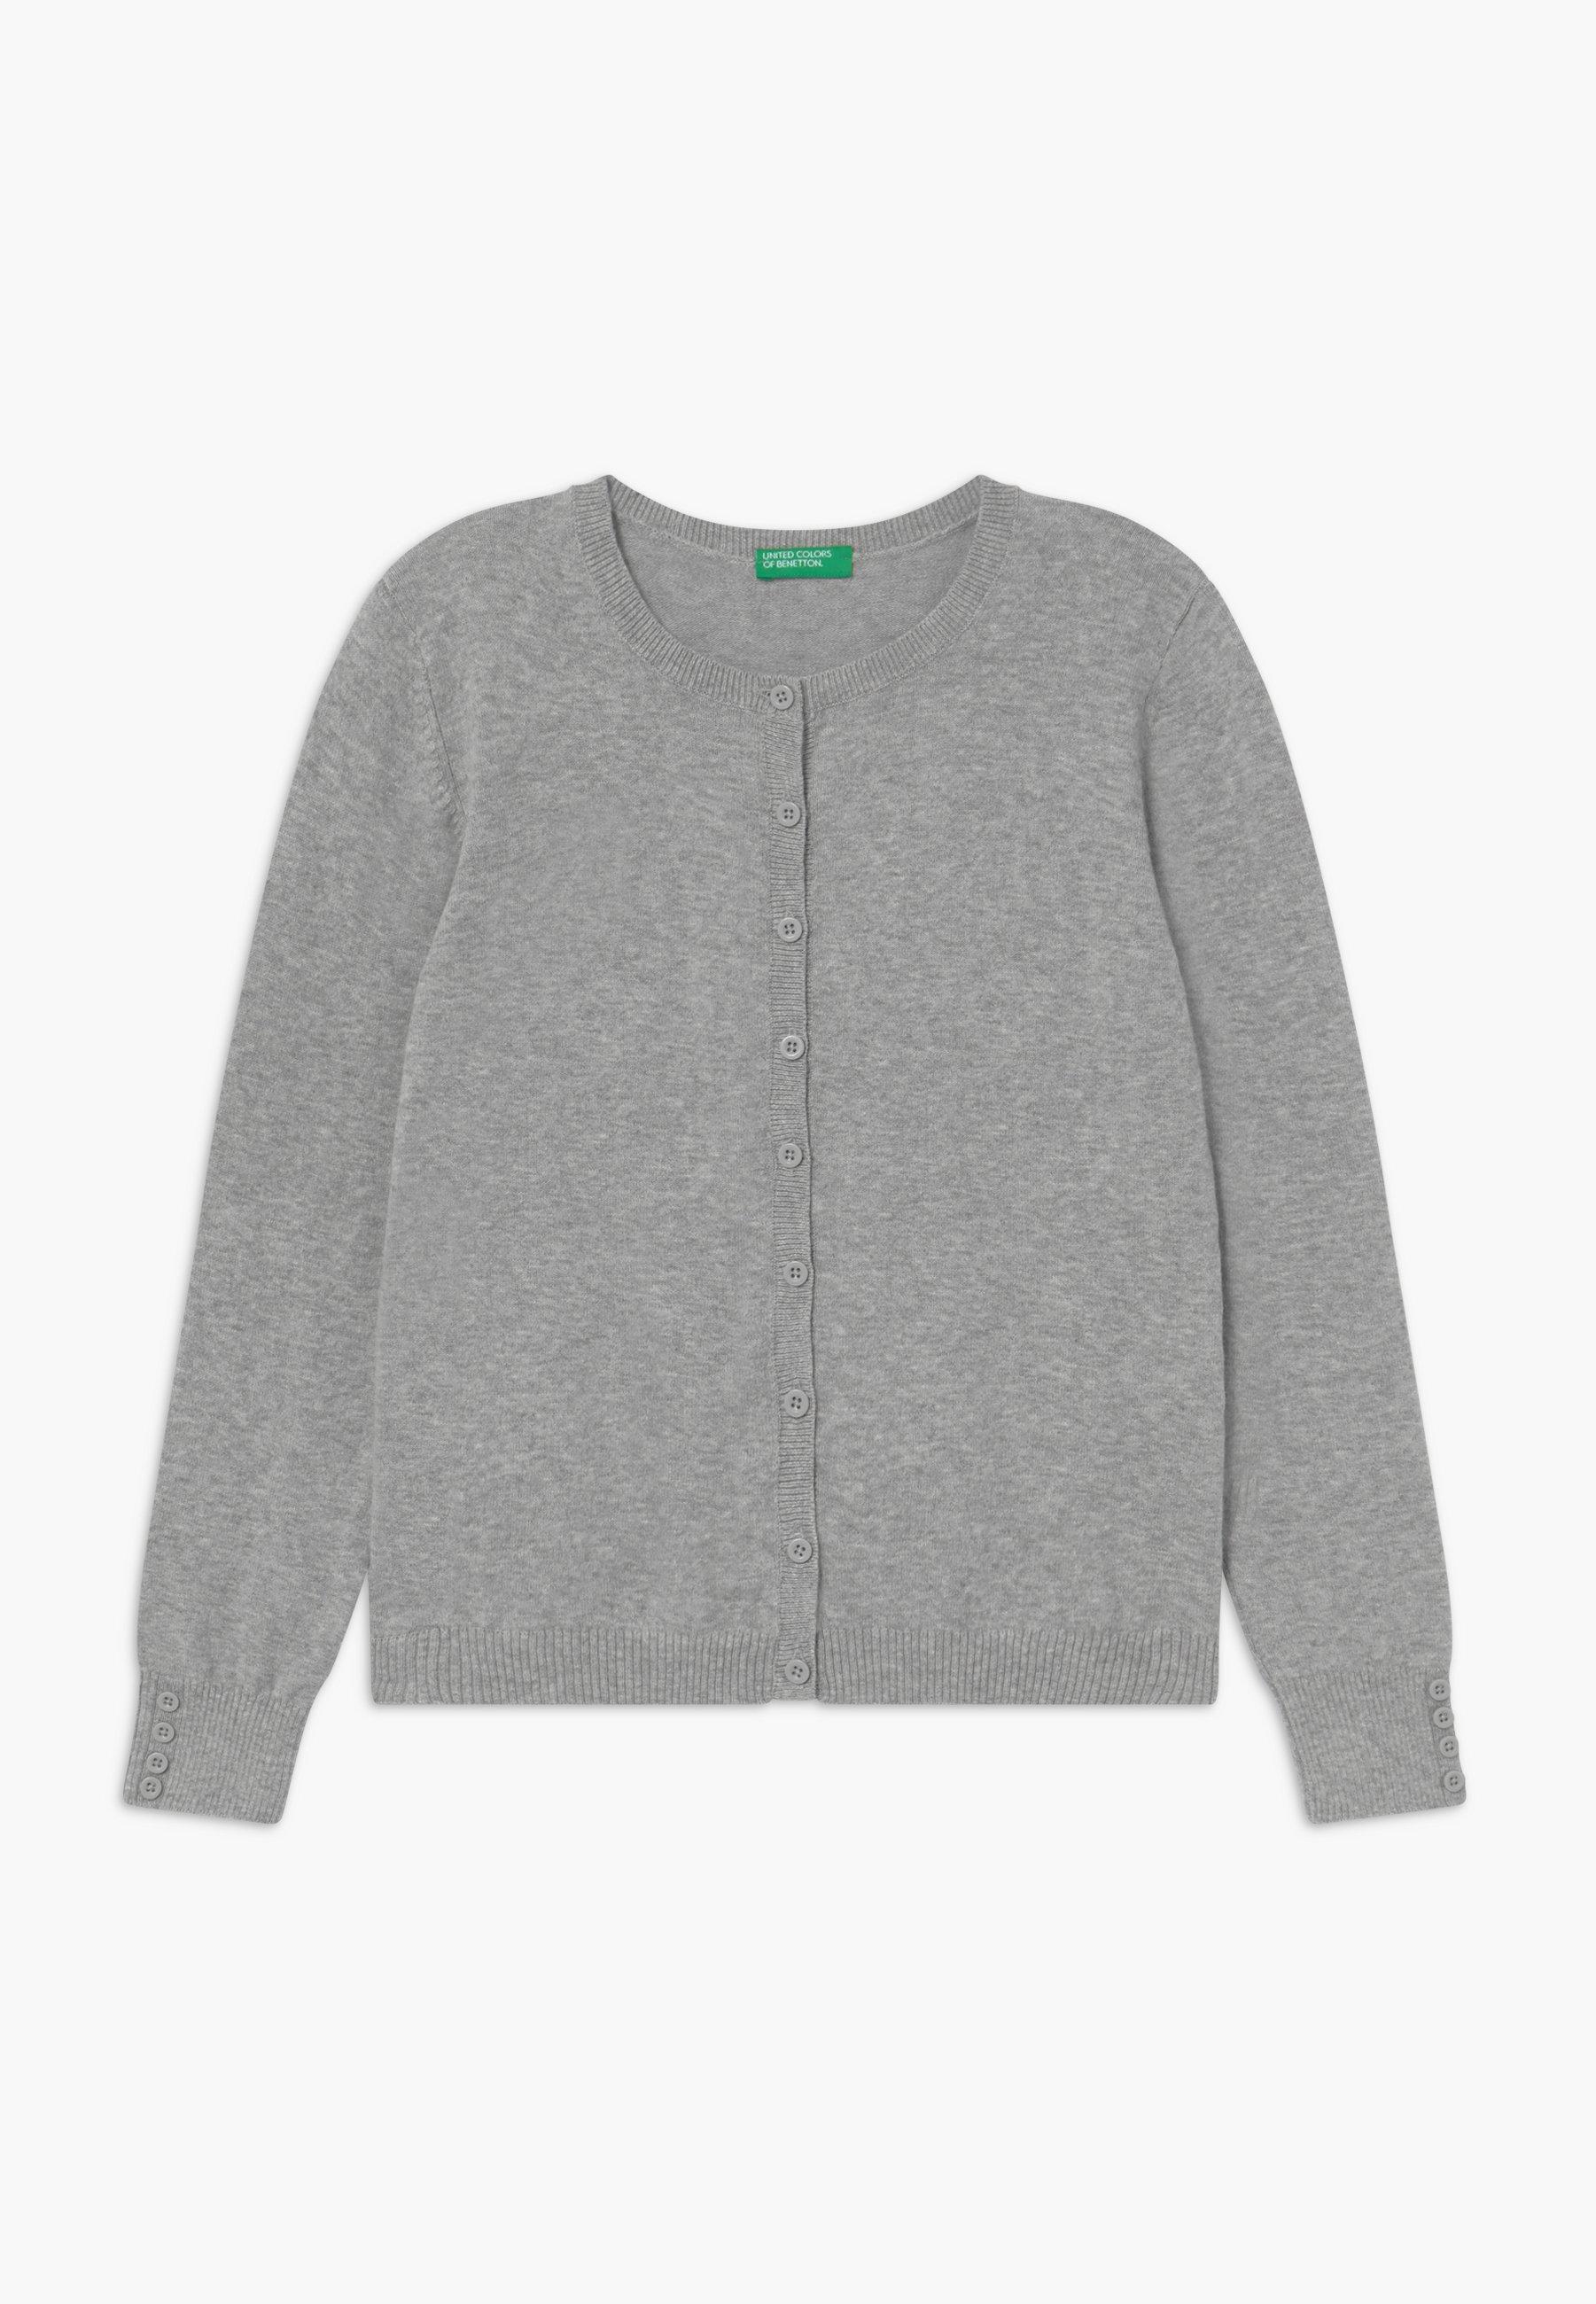 Große Förderung Benetton Strickjacke - grey | Damenbekleidung 2020